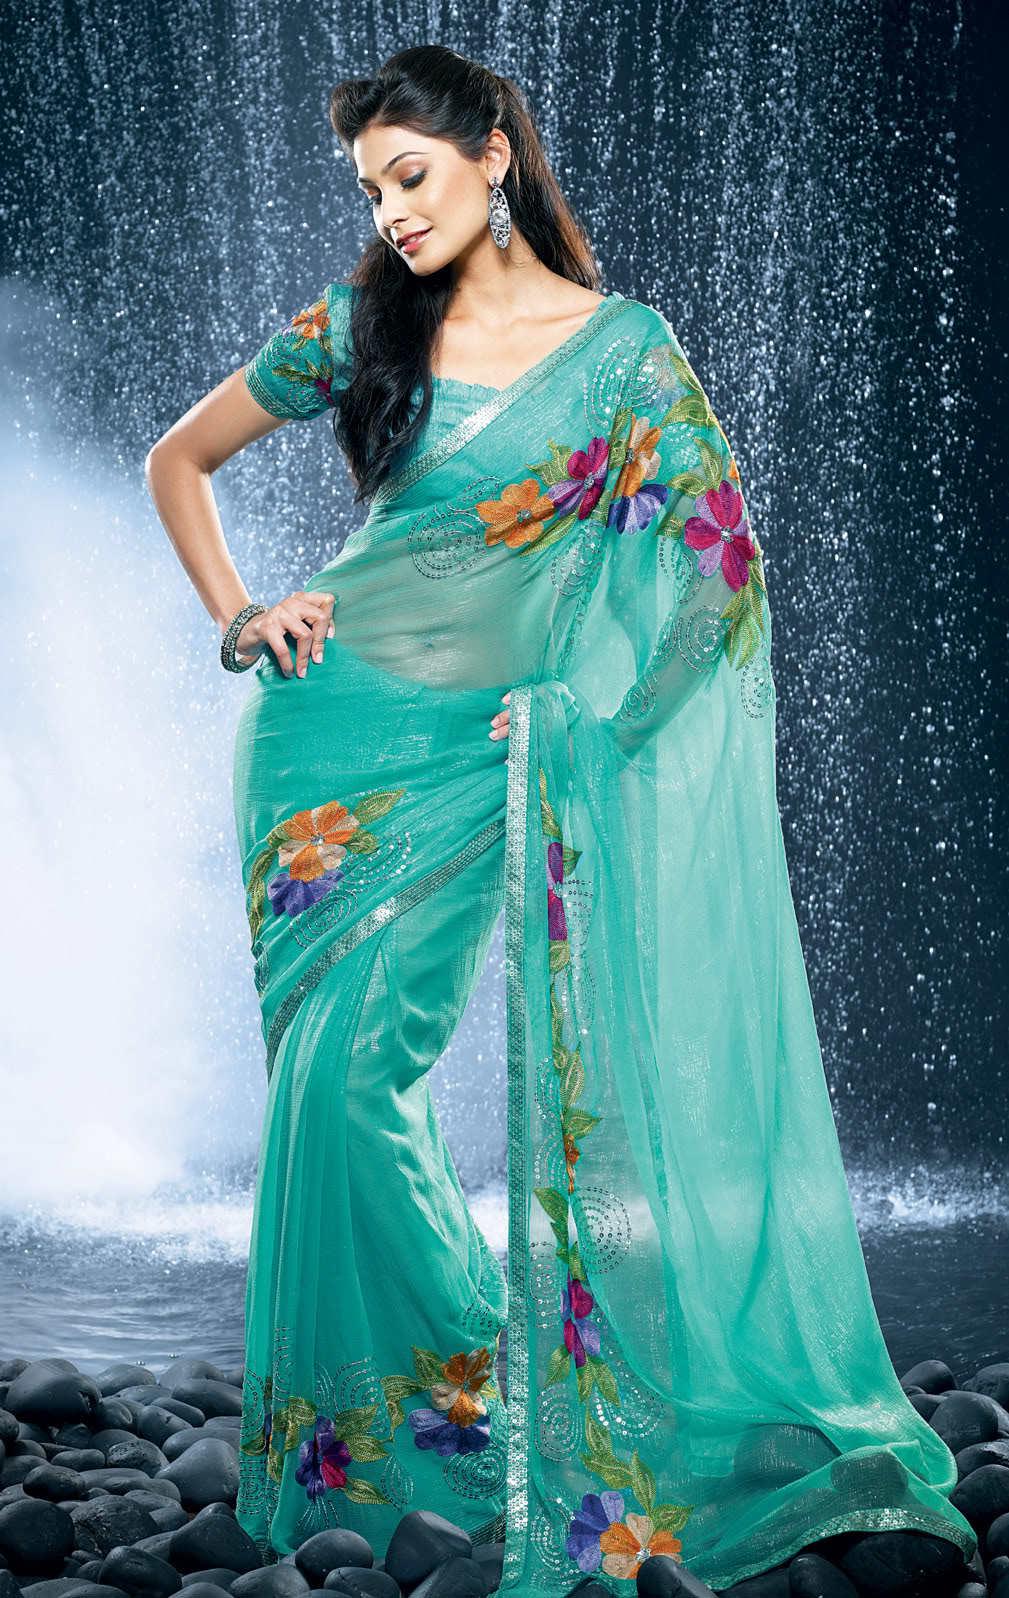 Bridal Girl Wallpaper Celebrity Gossip Sarees Models